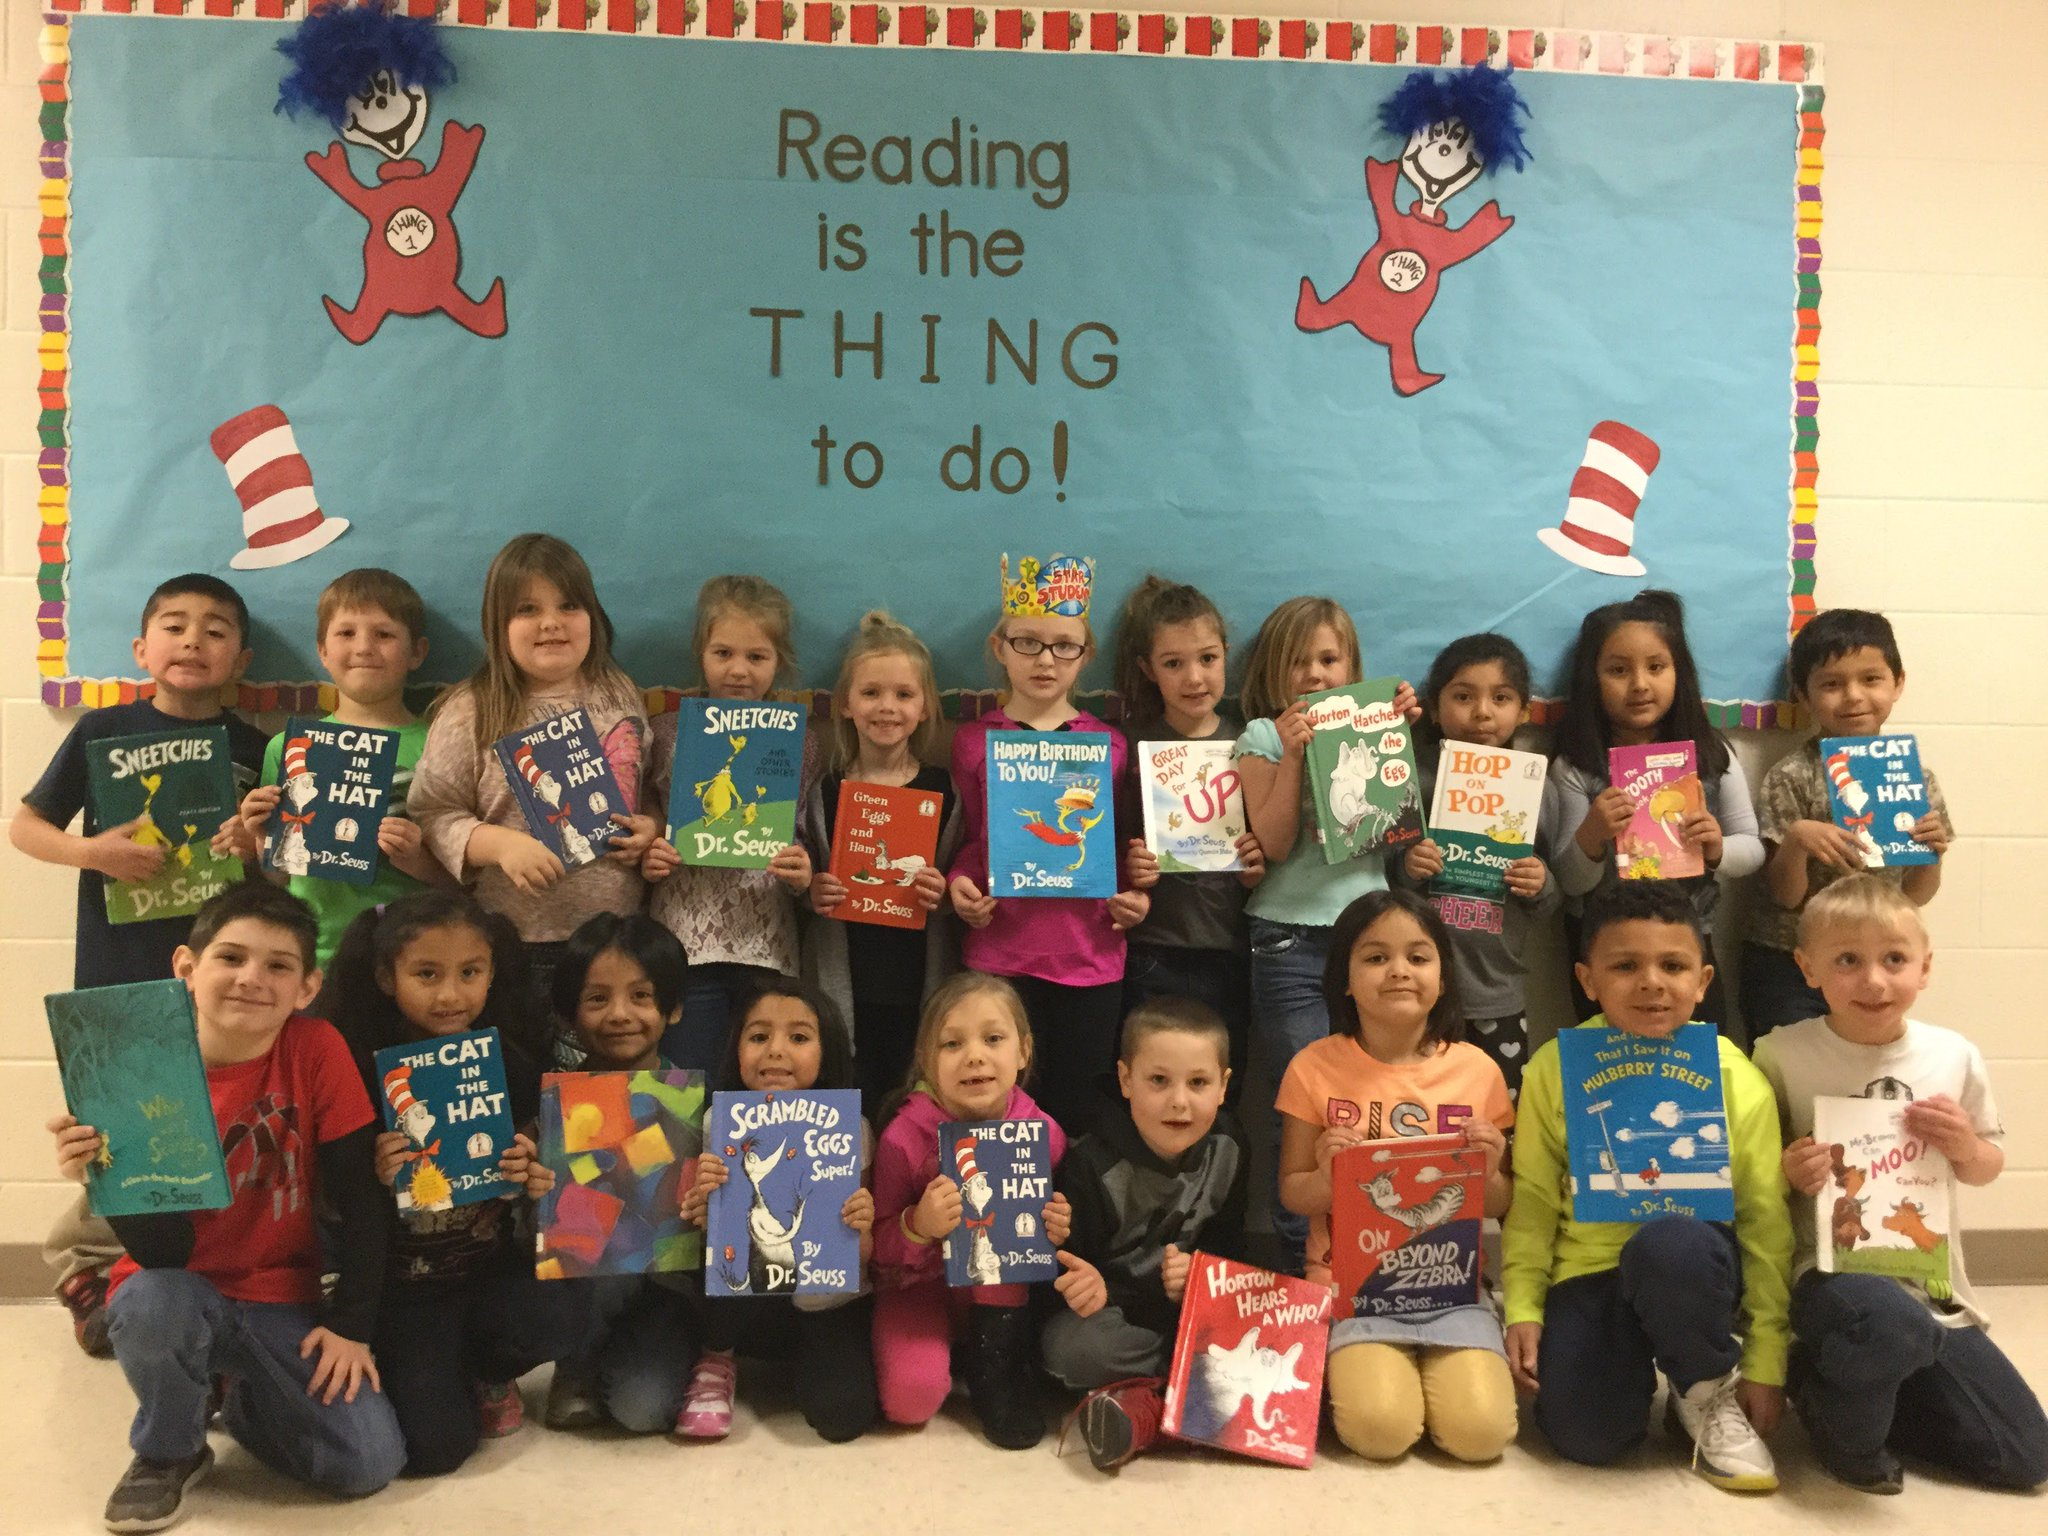 .@Region6WEAC Dr. Seuss' Birthday is Thursday! Darlington Public Schools are getting a head start, thanks to Gr8 teachers #ReadAcrossAmerica https://t.co/u3syadnHQB